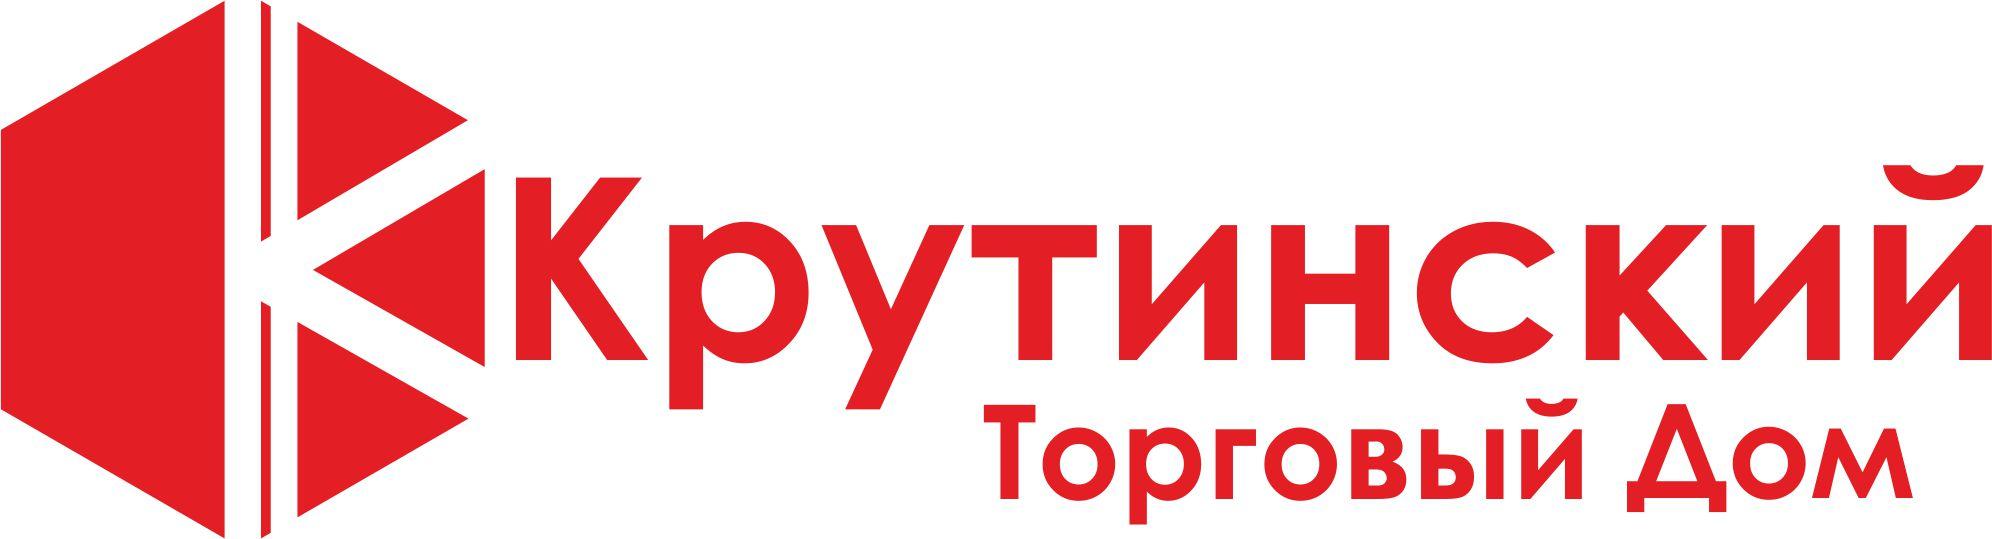 Логотип для камнедобывающей компании фото f_8345b9a039140c46.jpg